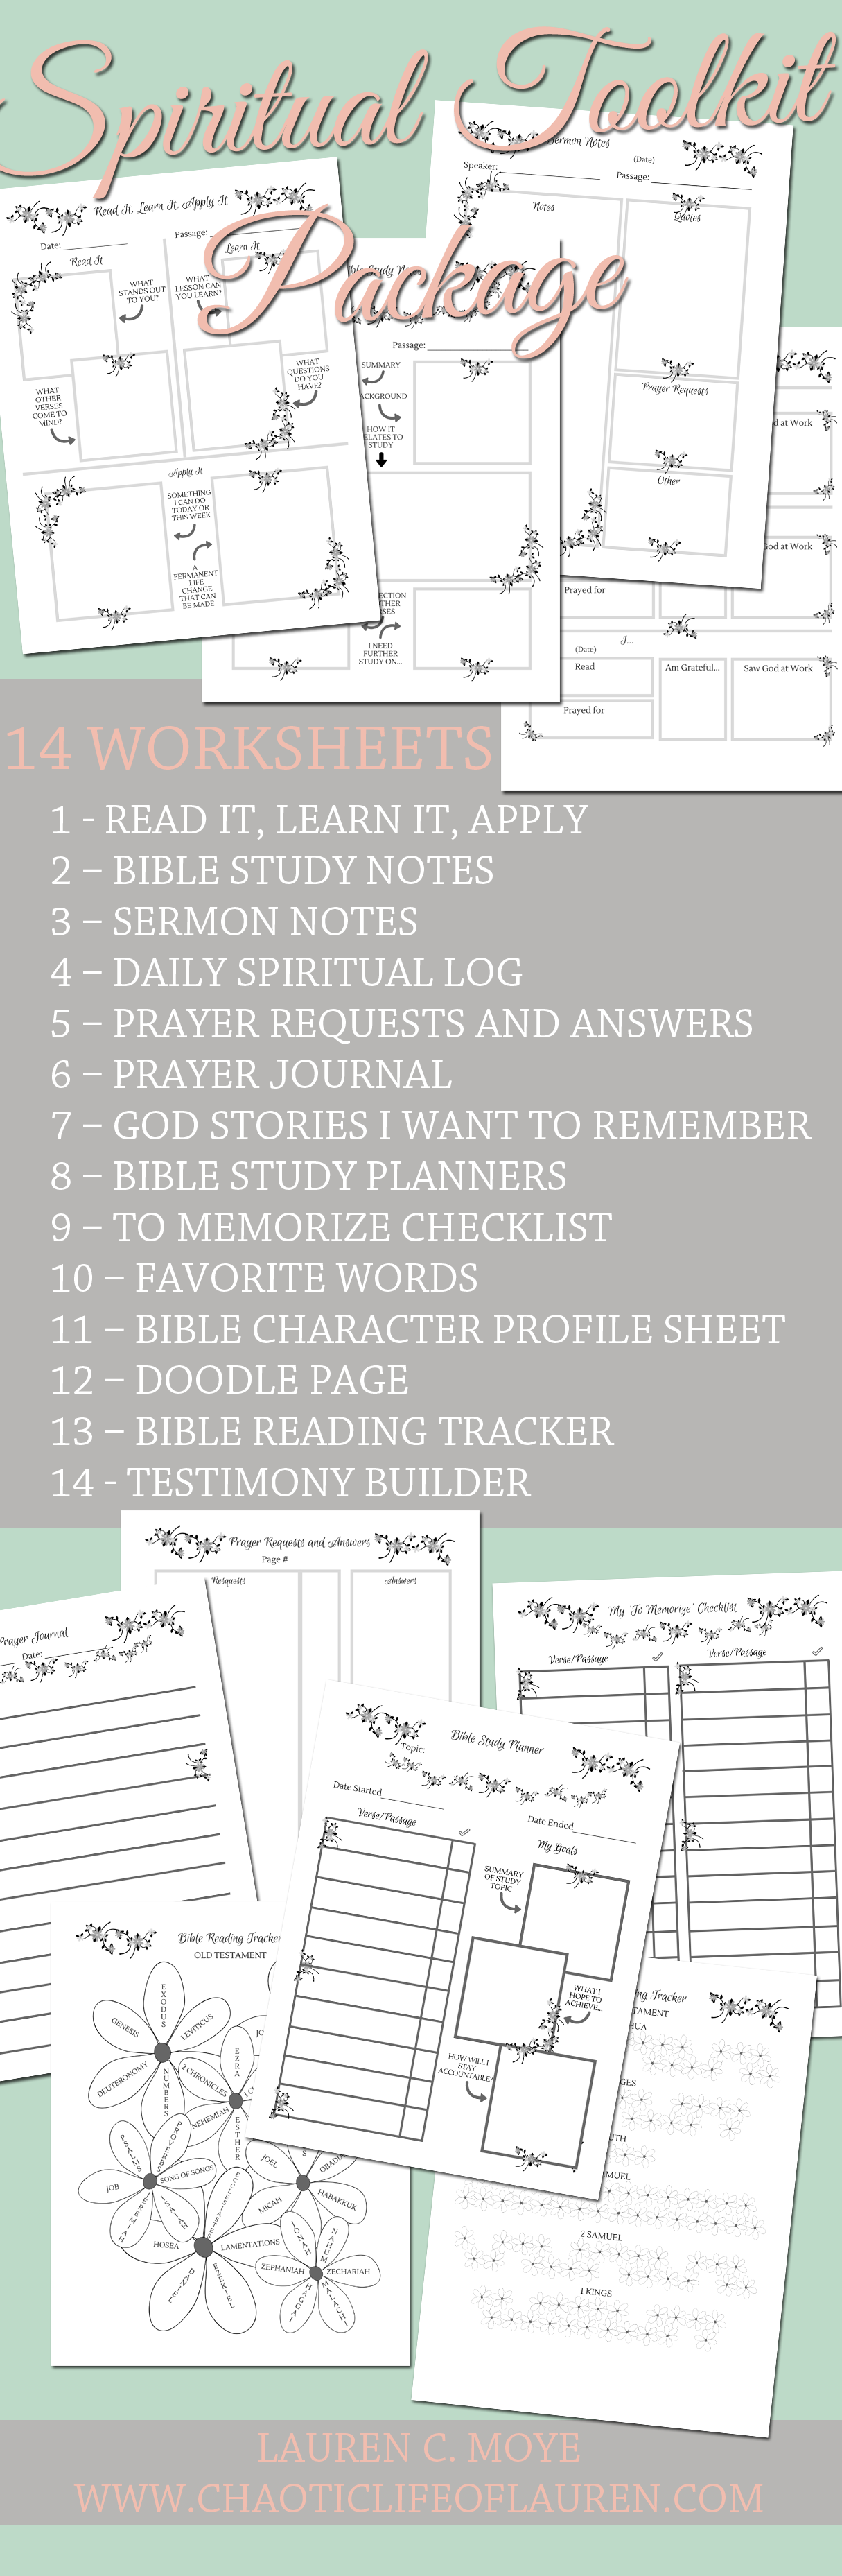 Spiritual Toolkit Package Worksheets